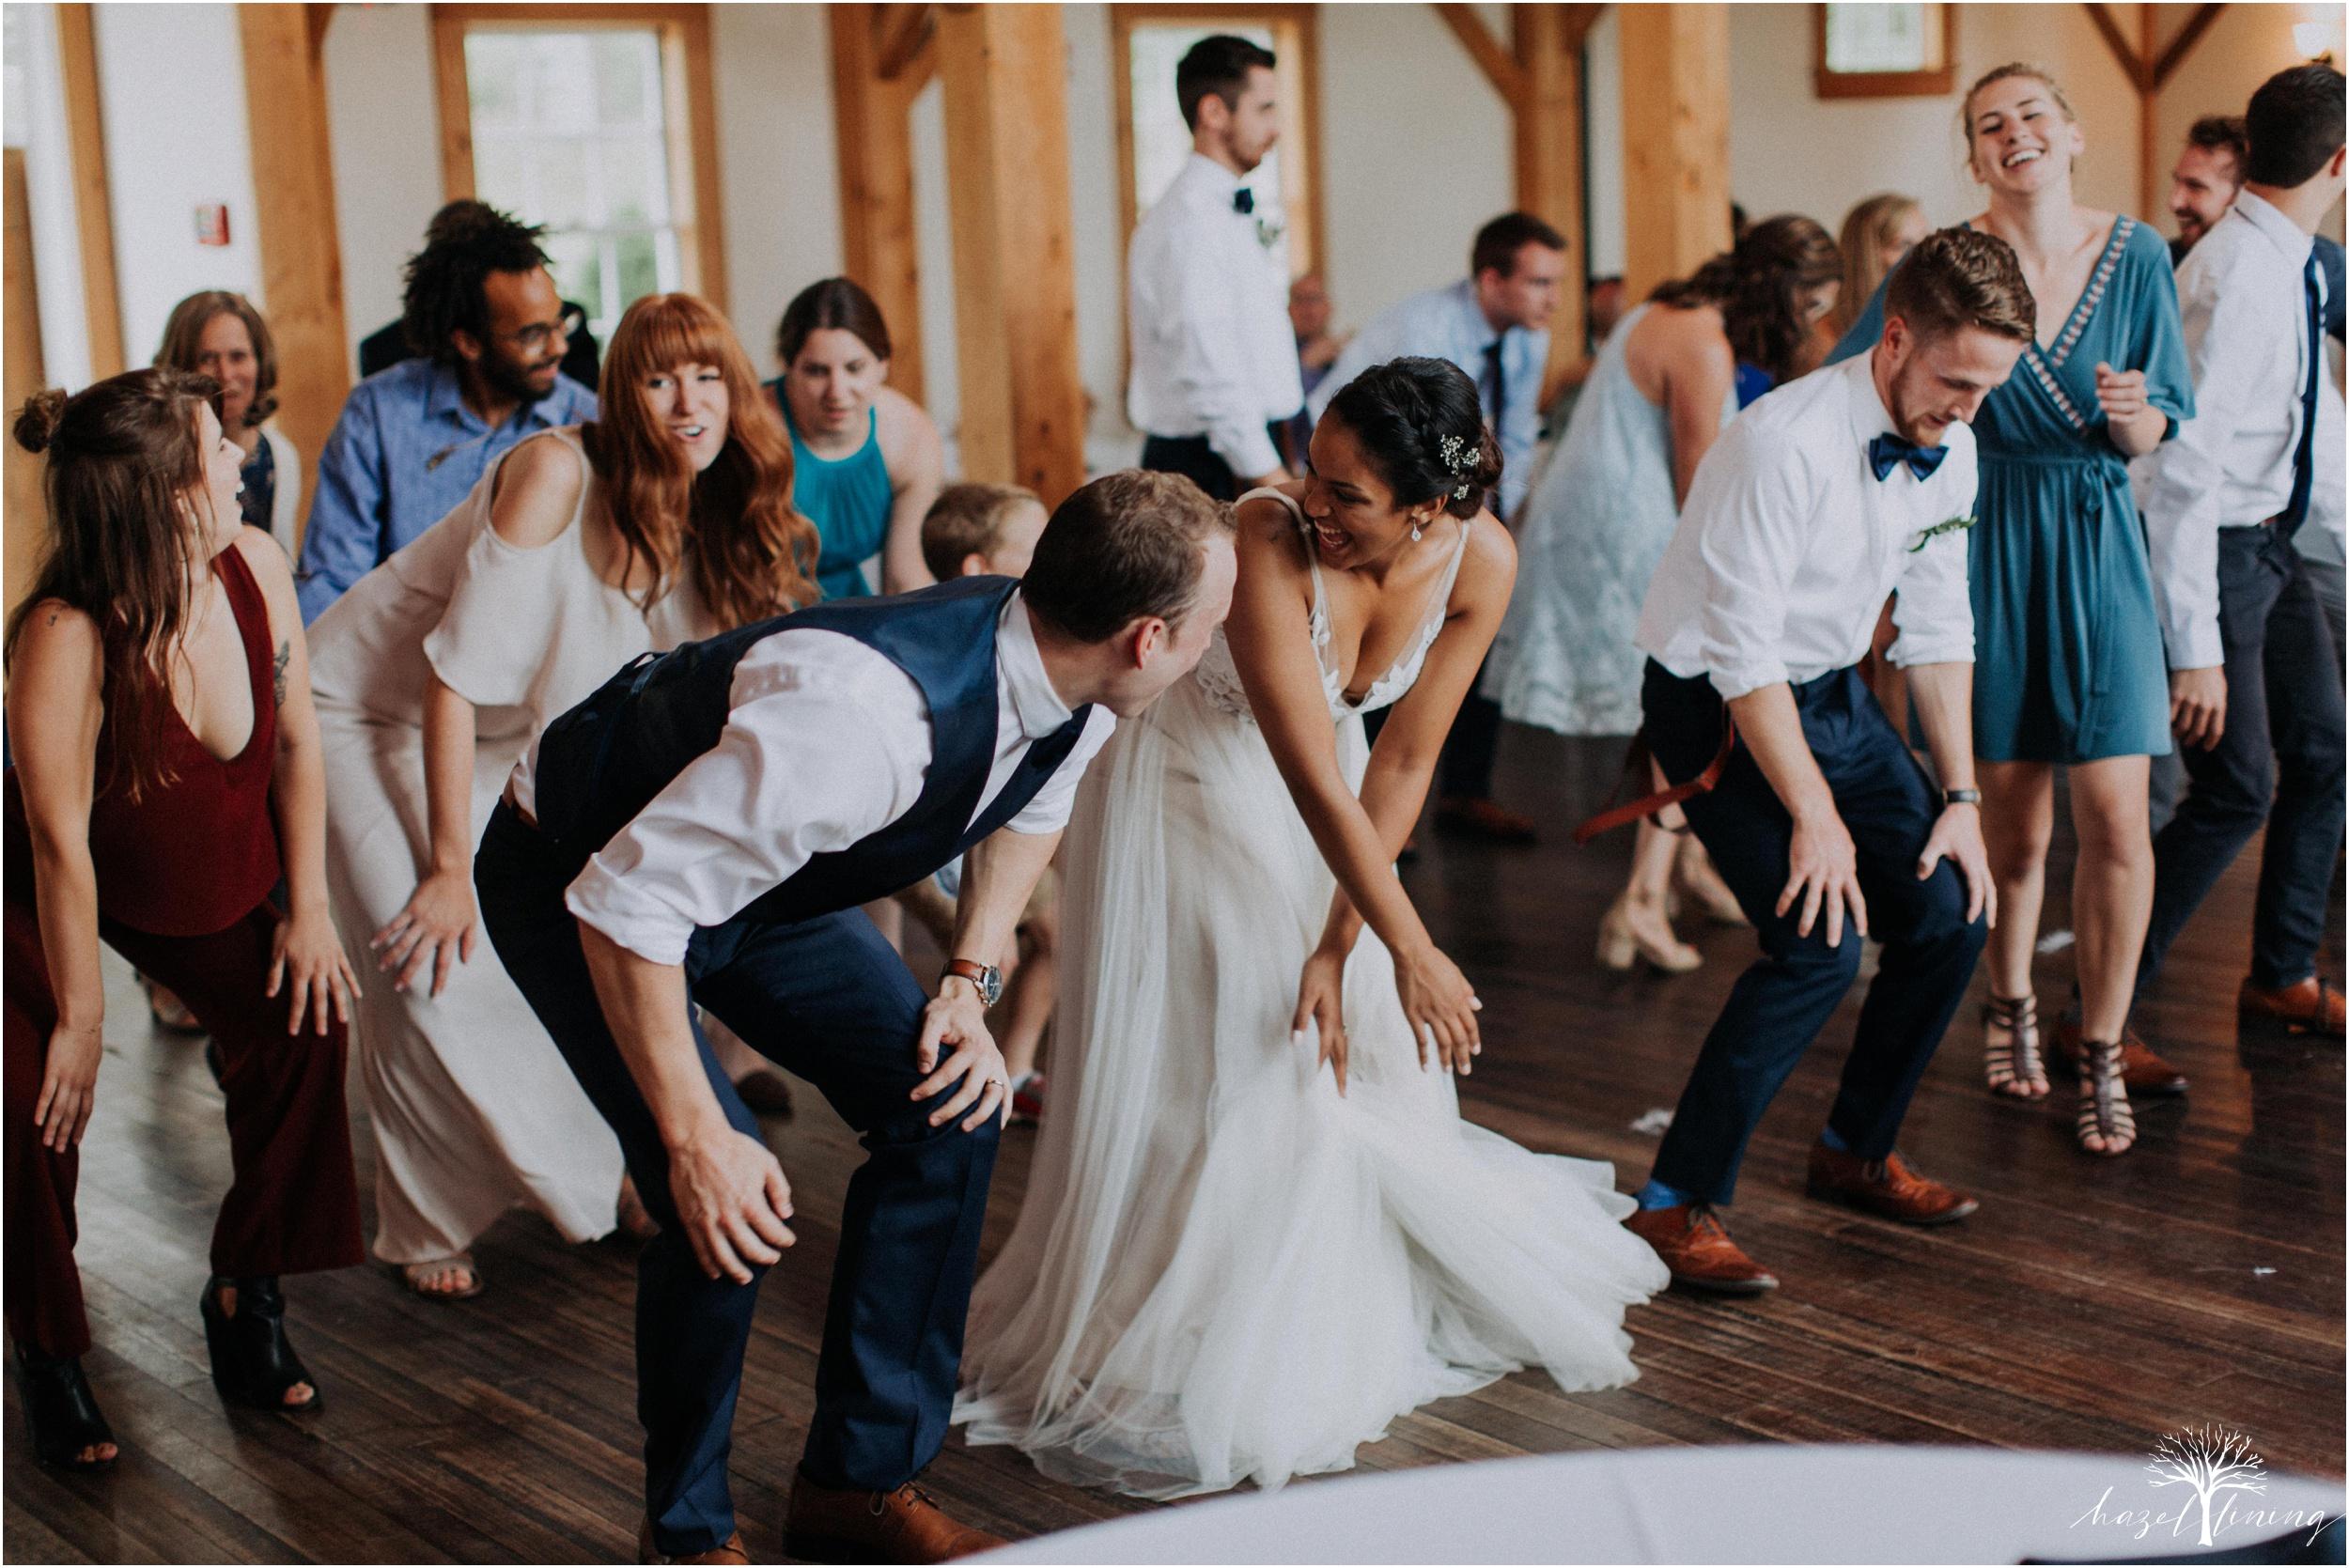 mariah-kreyling-samuel-sherratt-sherrattwiththeworld-peirce-farm-at-witch-hill-boston-massachusetts-wedding-photography-hazel-lining-travel-wedding-elopement-photography_0192.jpg